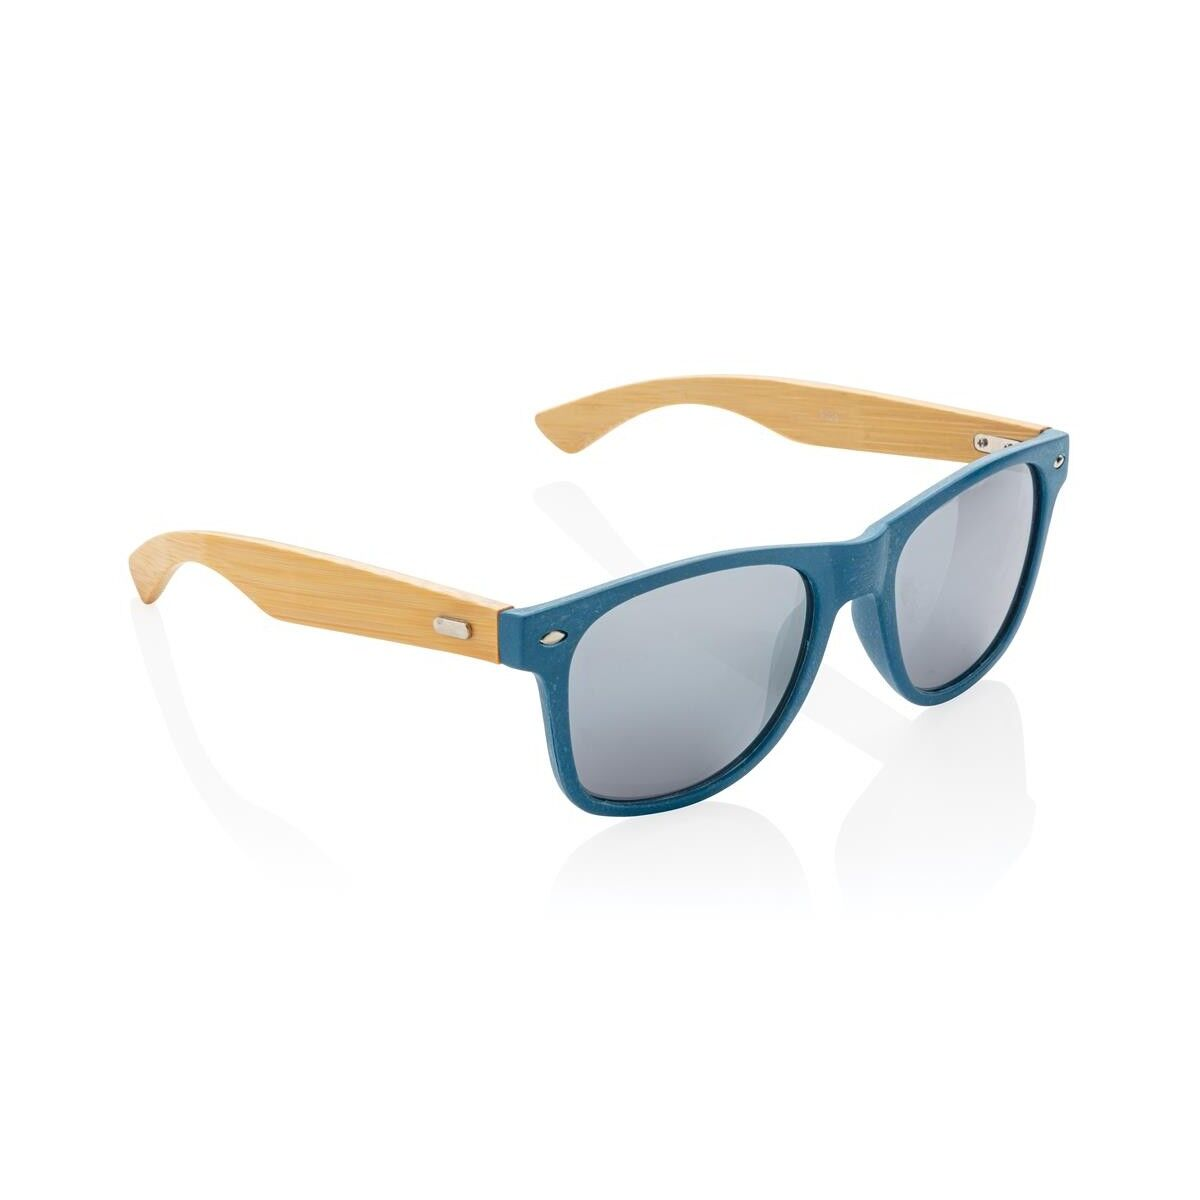 Colour Wheat Straw & Bamboo Sunglasses - Blue